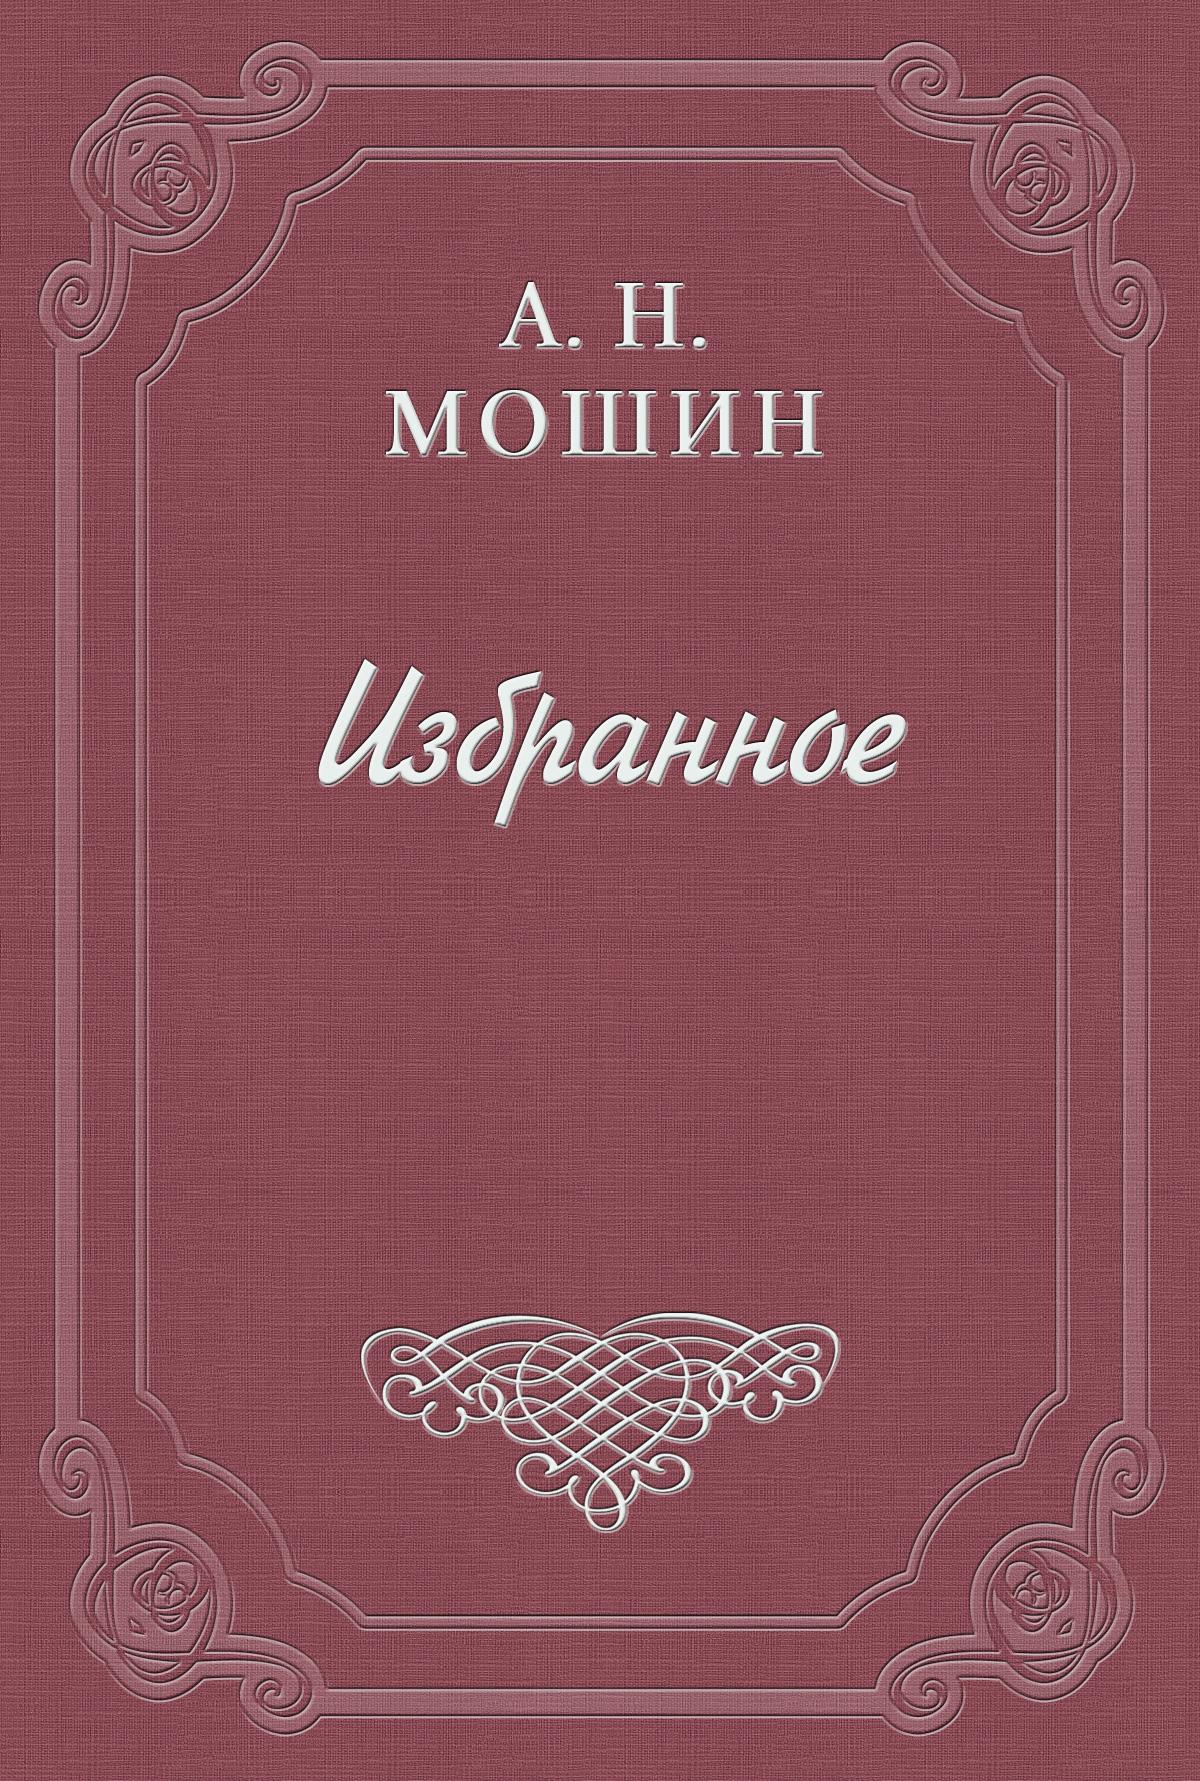 Алексей Мошин Нужда